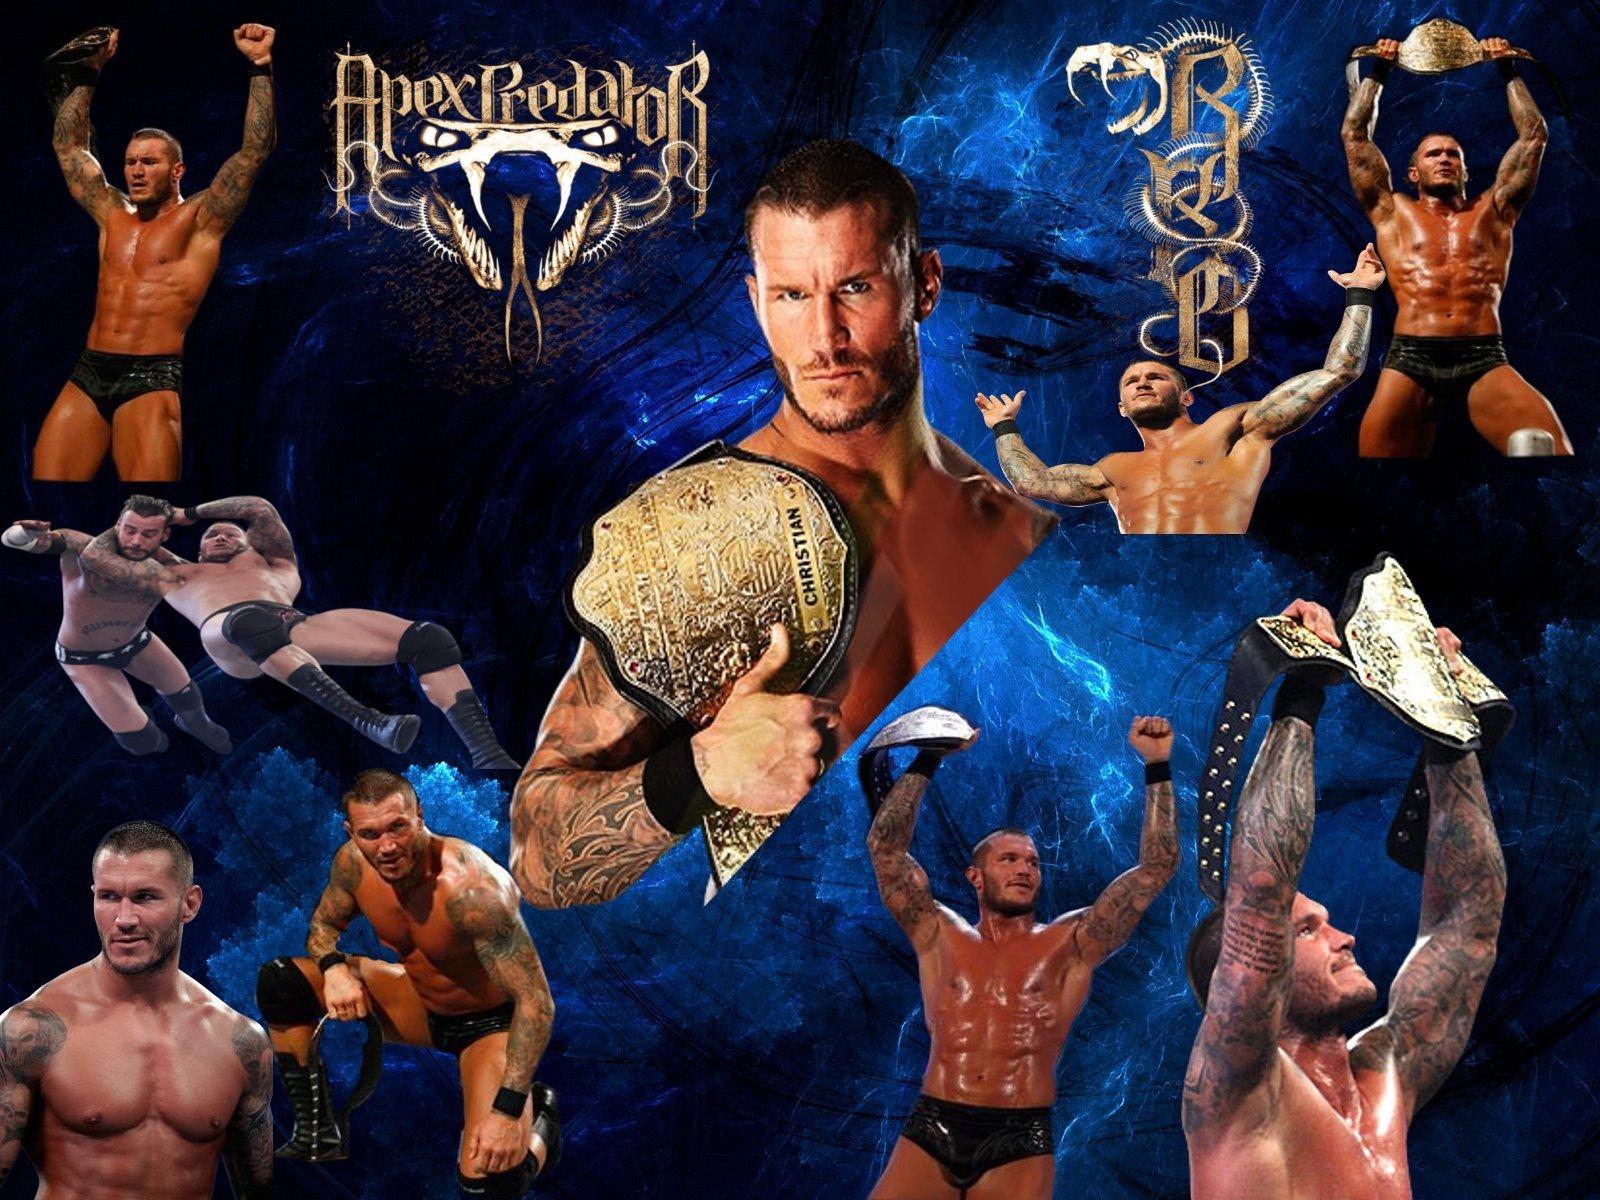 Randy Orton new World Champion 2011 - Randy Orton ...